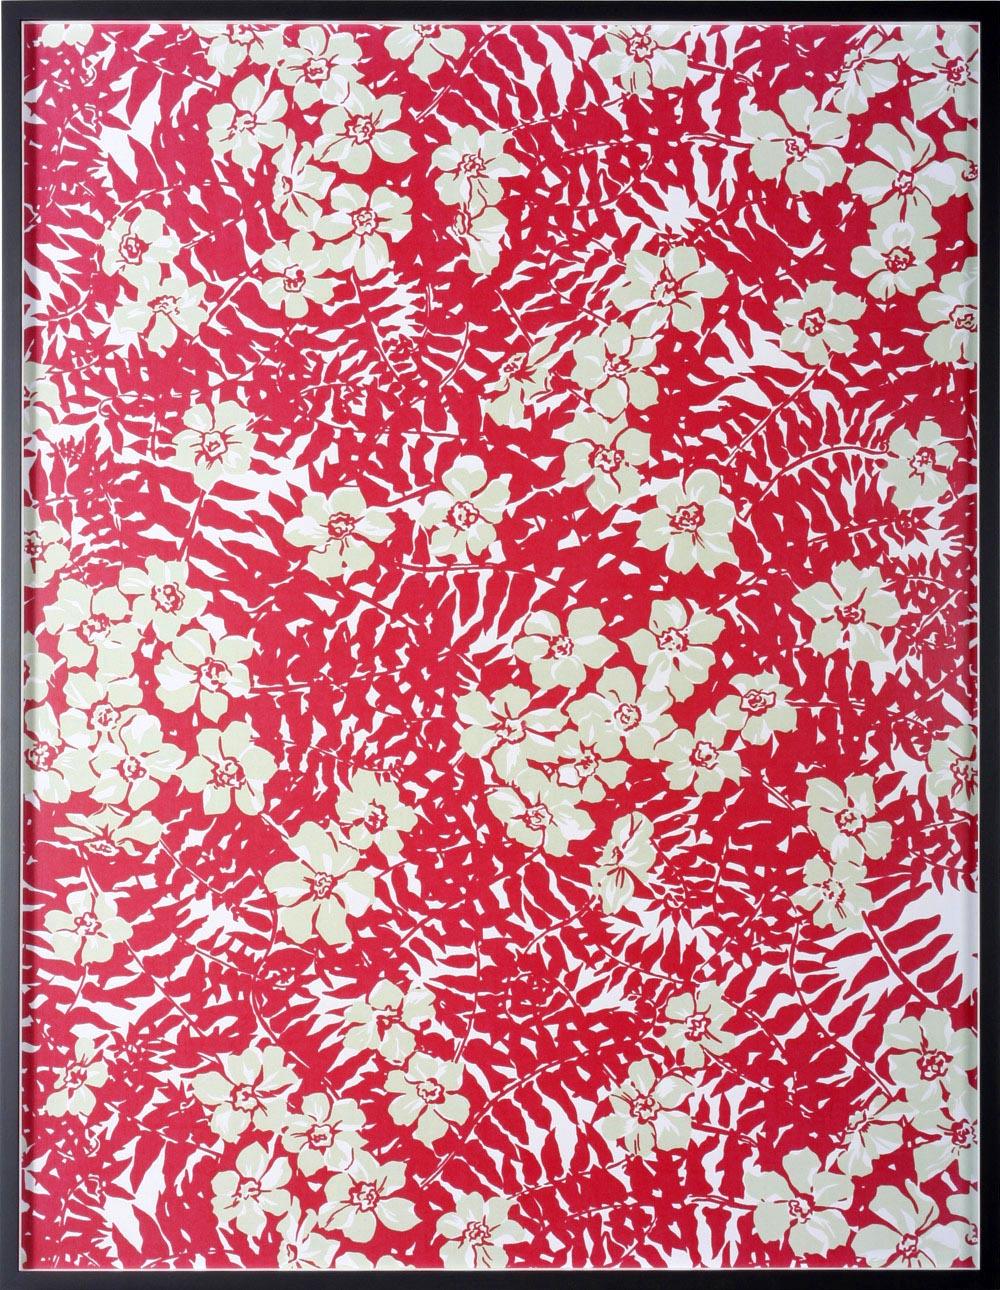 "Annette Kelm Big Print #2 ( Maui Fern cotton ""mainsail cloth"" fall 1949 design Dorothy Draper, courtesy Schumacher &Co) 2007 C-Print: 131.5 x 100.5 cm"